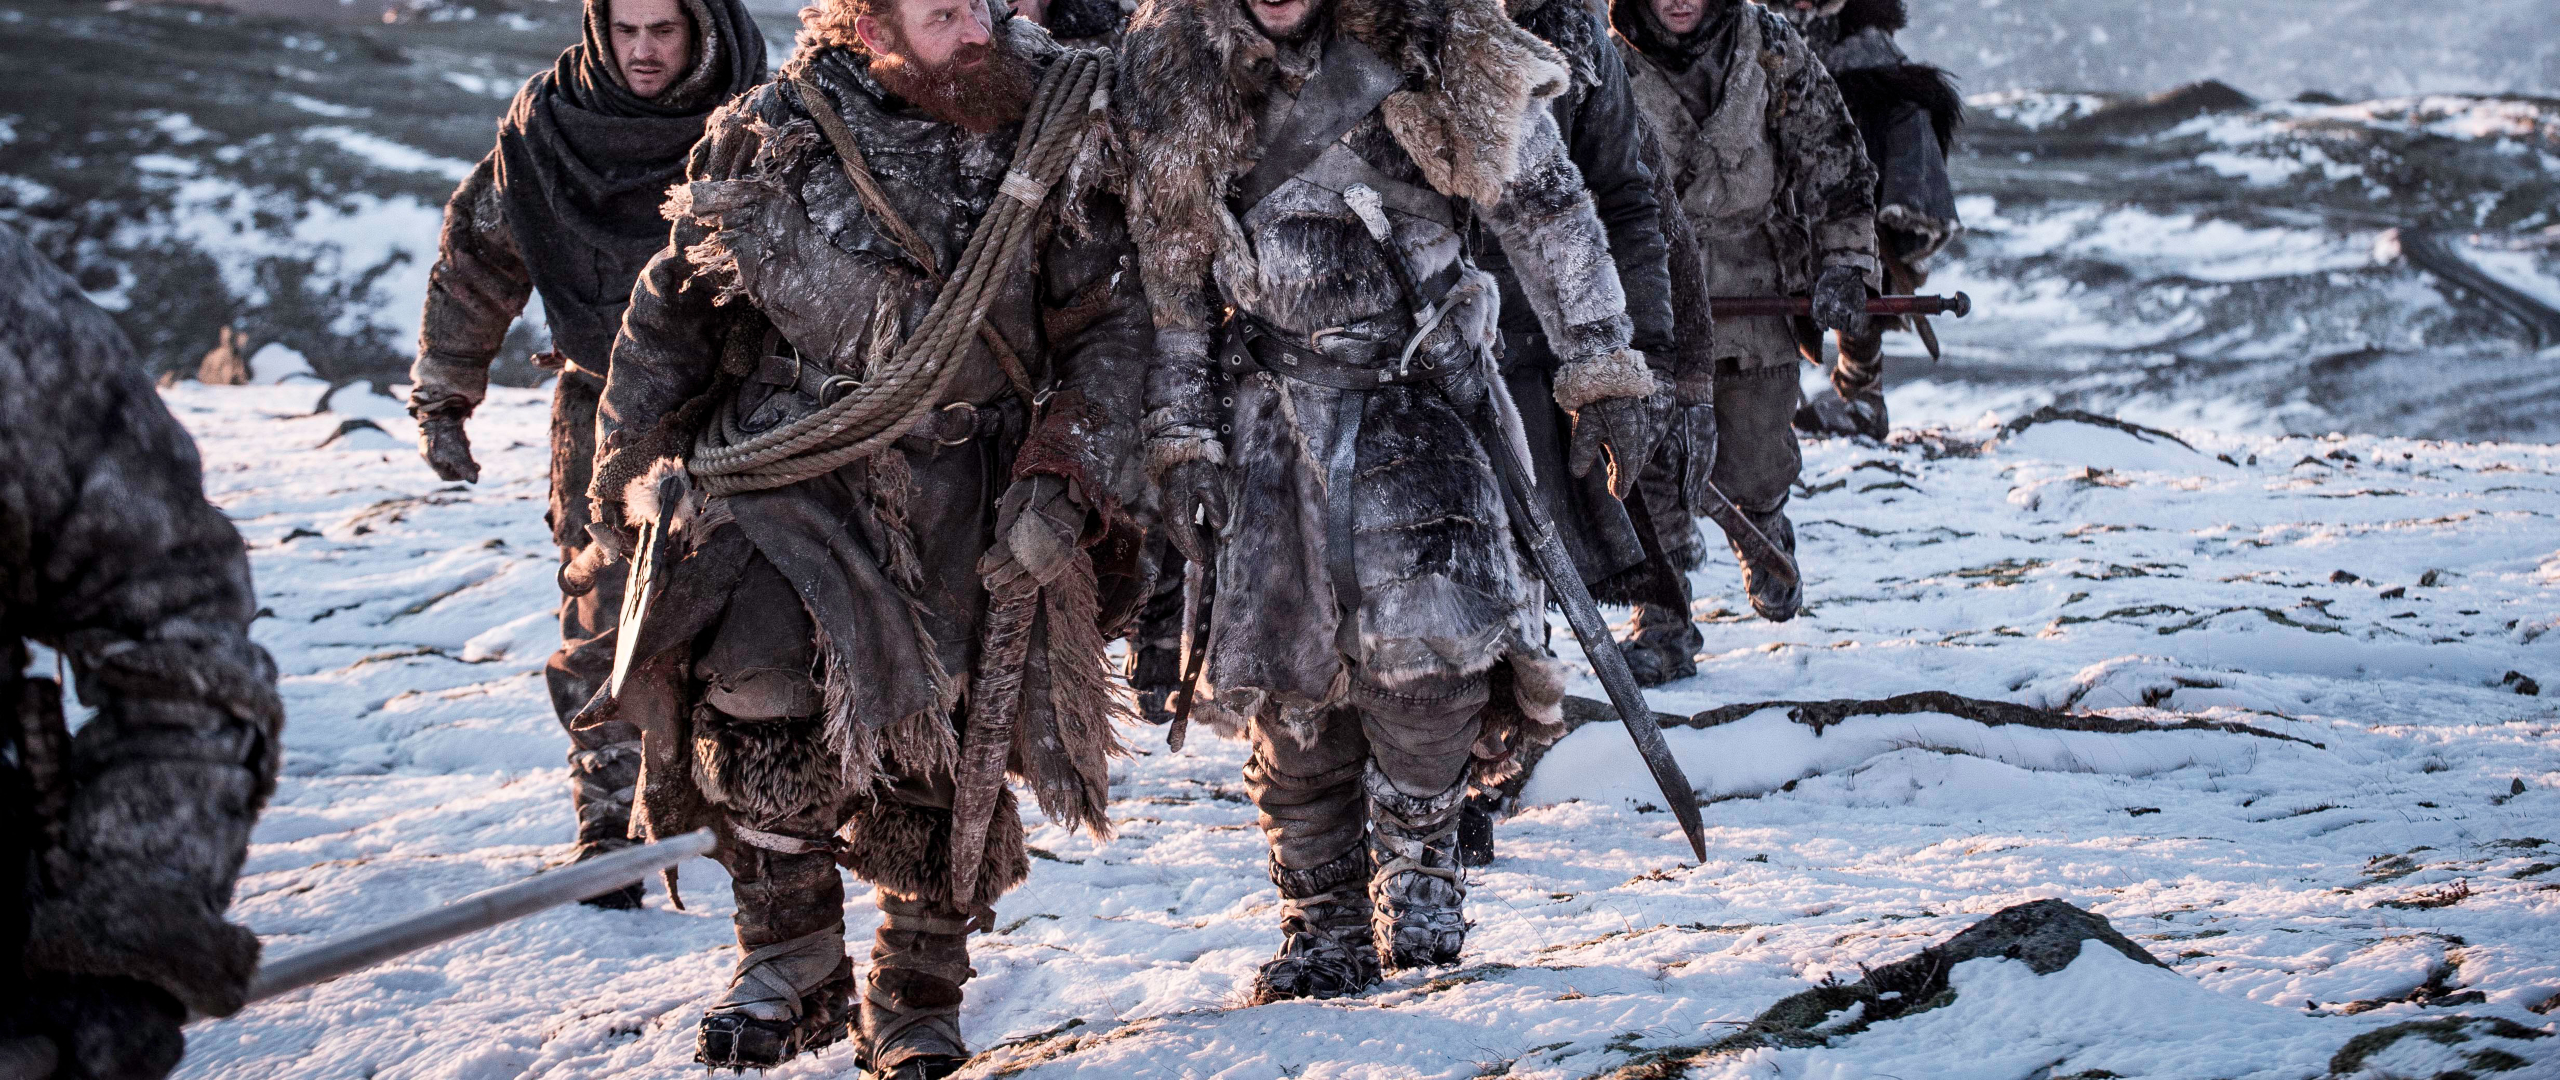 Game Of Thrones Season 7 Ep. 6, HD 4K Wallpaper